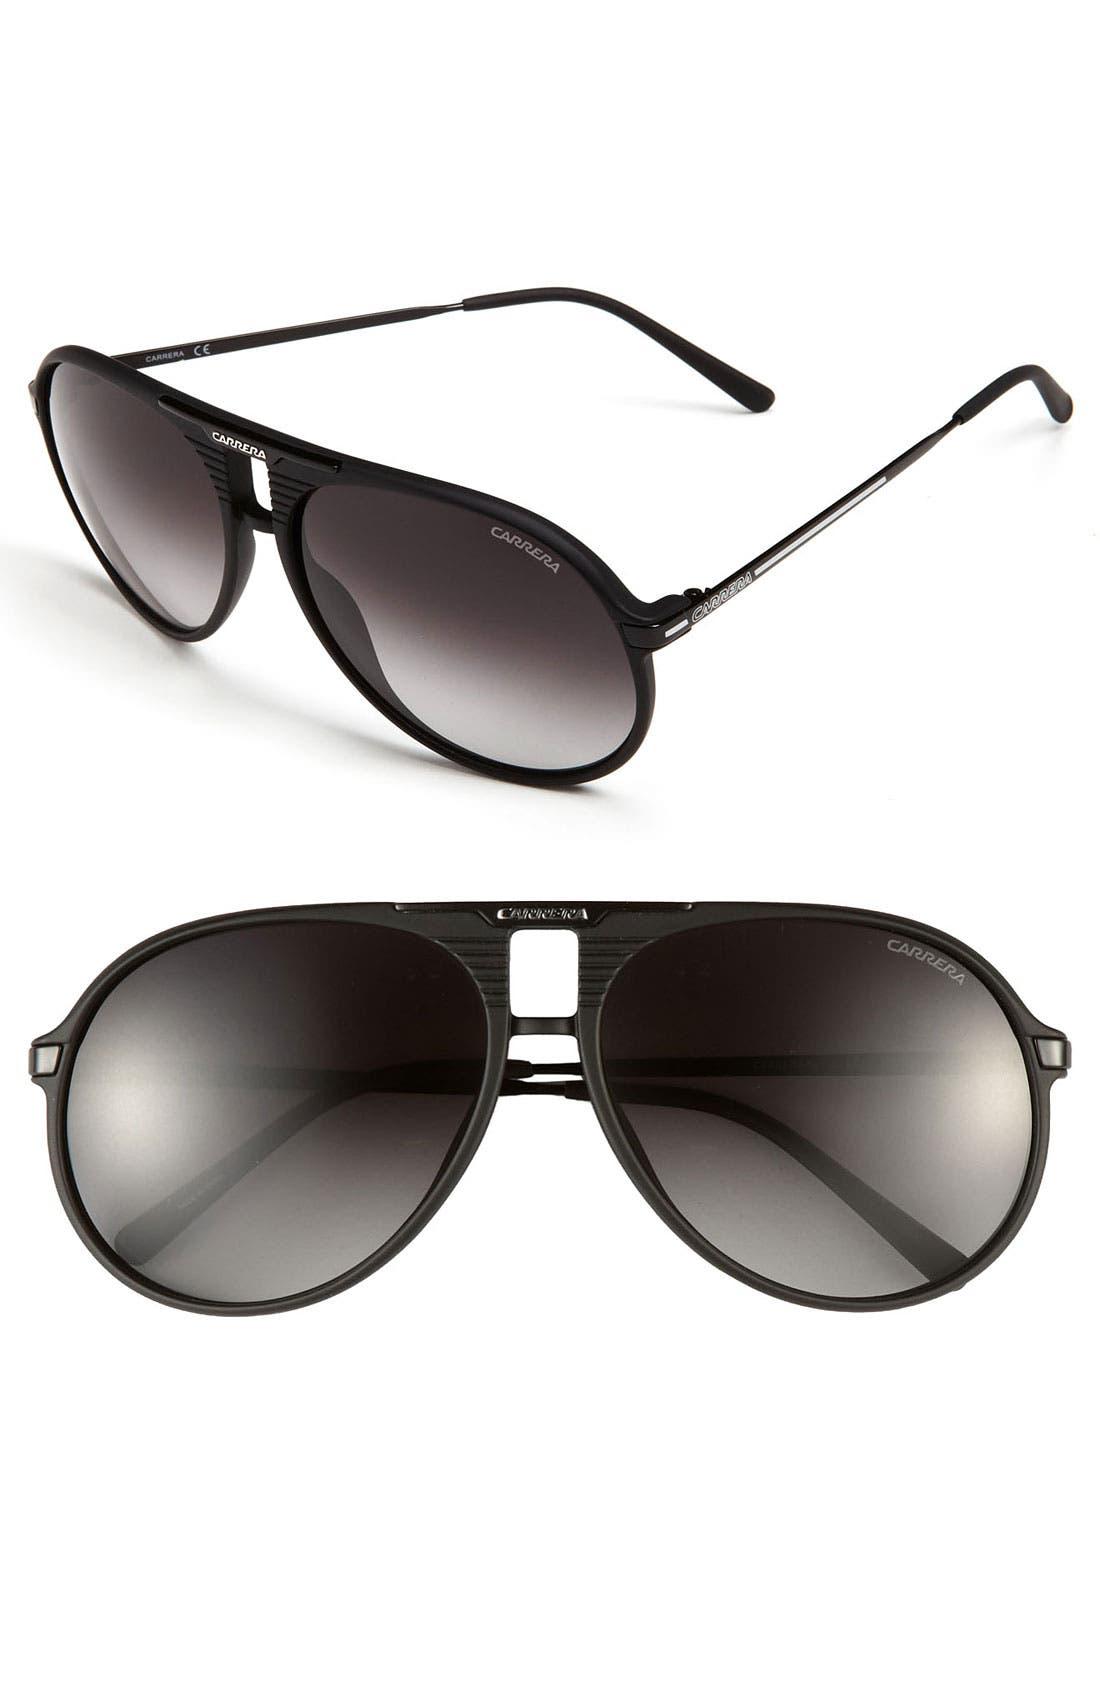 Main Image - Carrera Eyewear 60mm Sunglasses